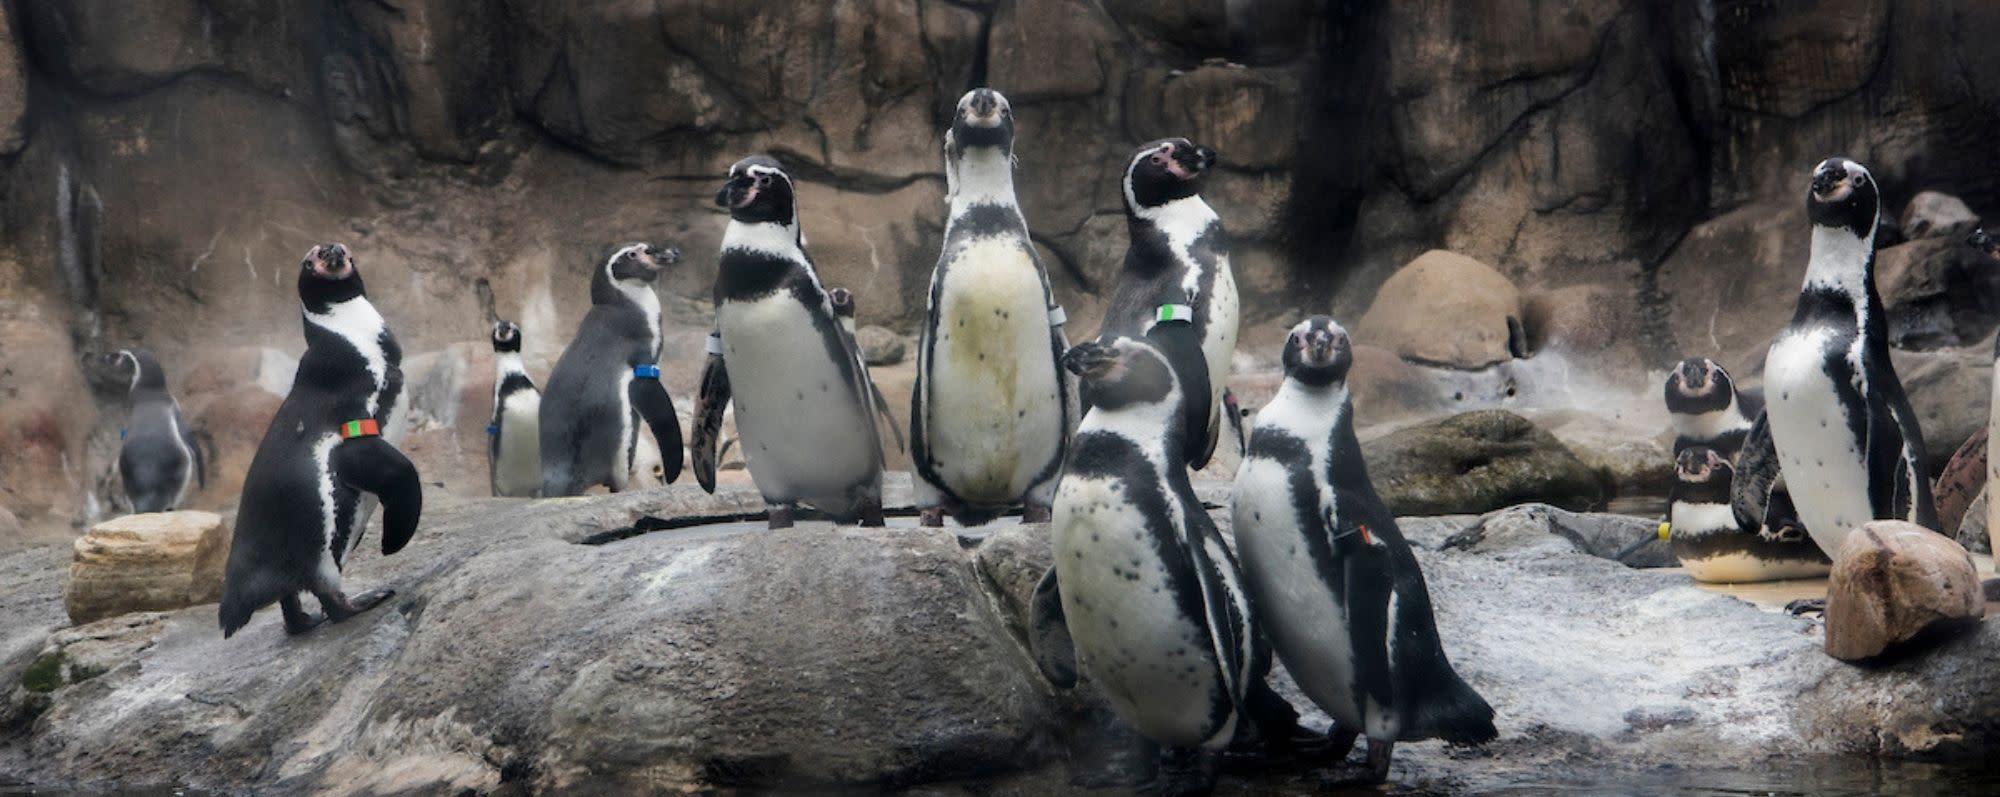 Rosamond Gifford Zoo penguins